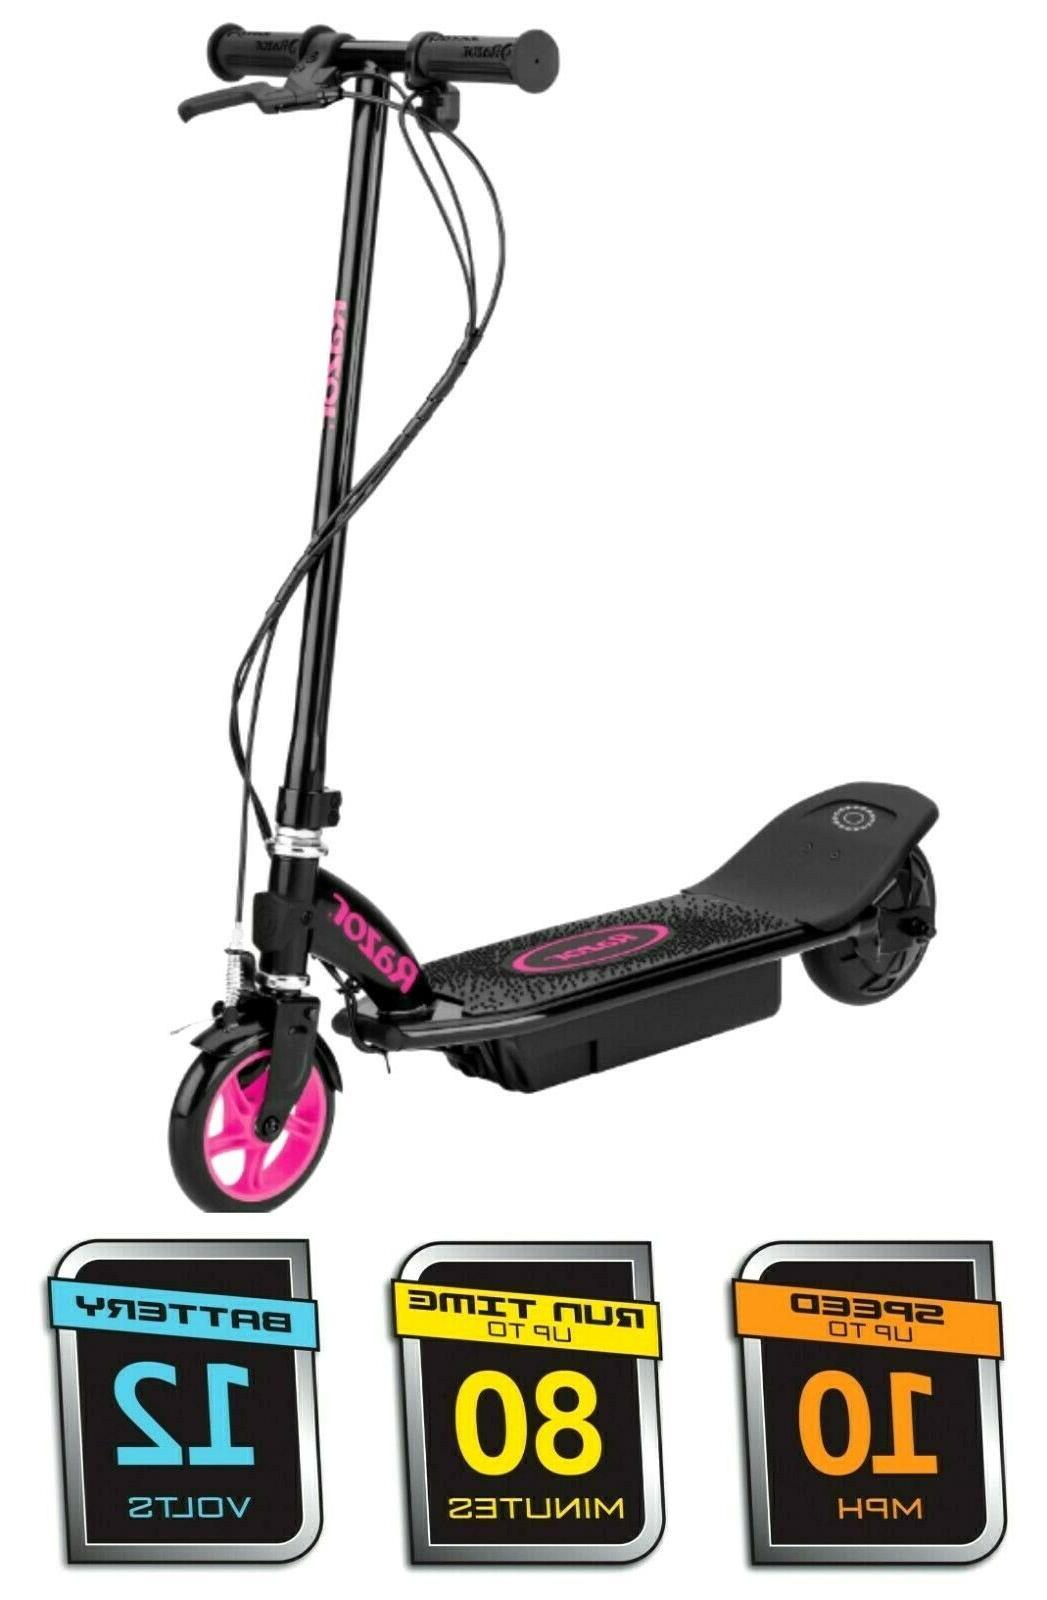 motor kids scooter 2 wheels teen kids